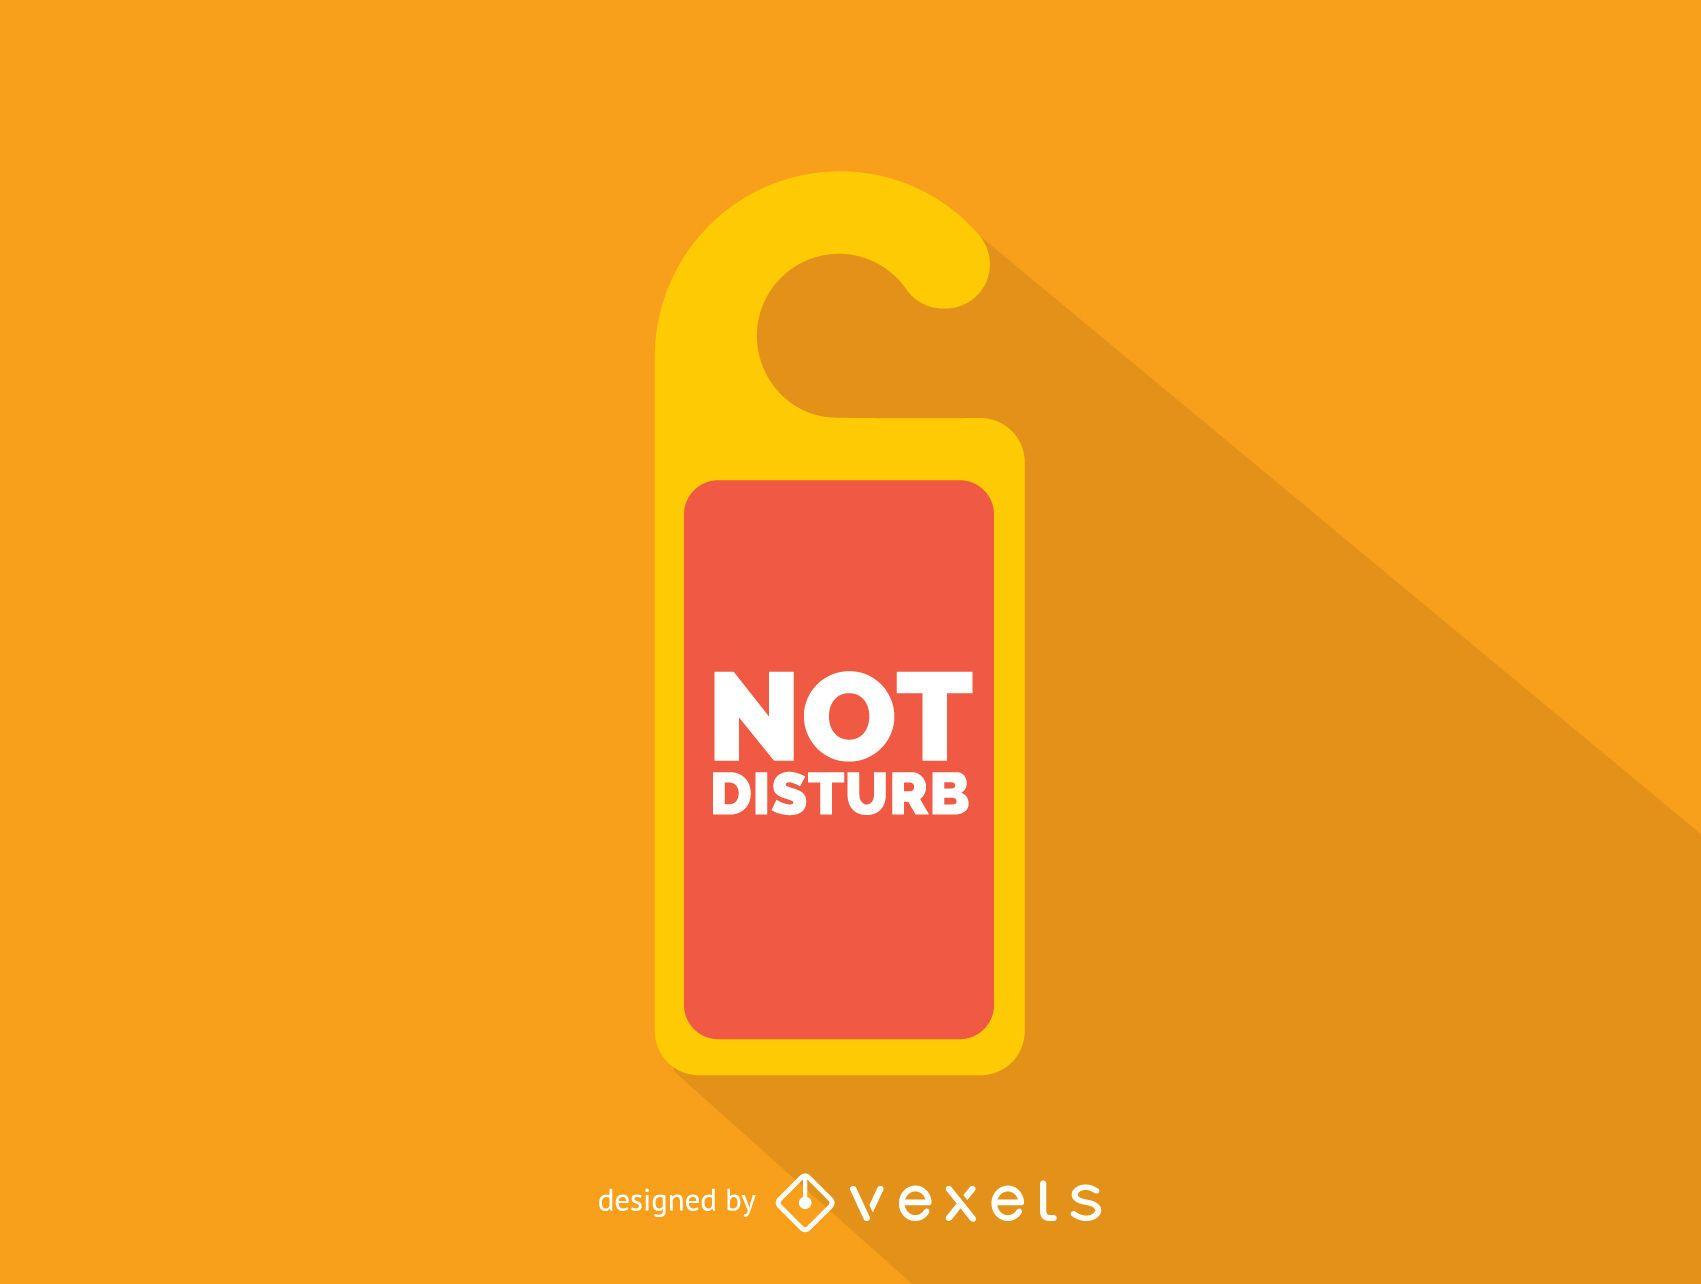 Not disturb room sign icon